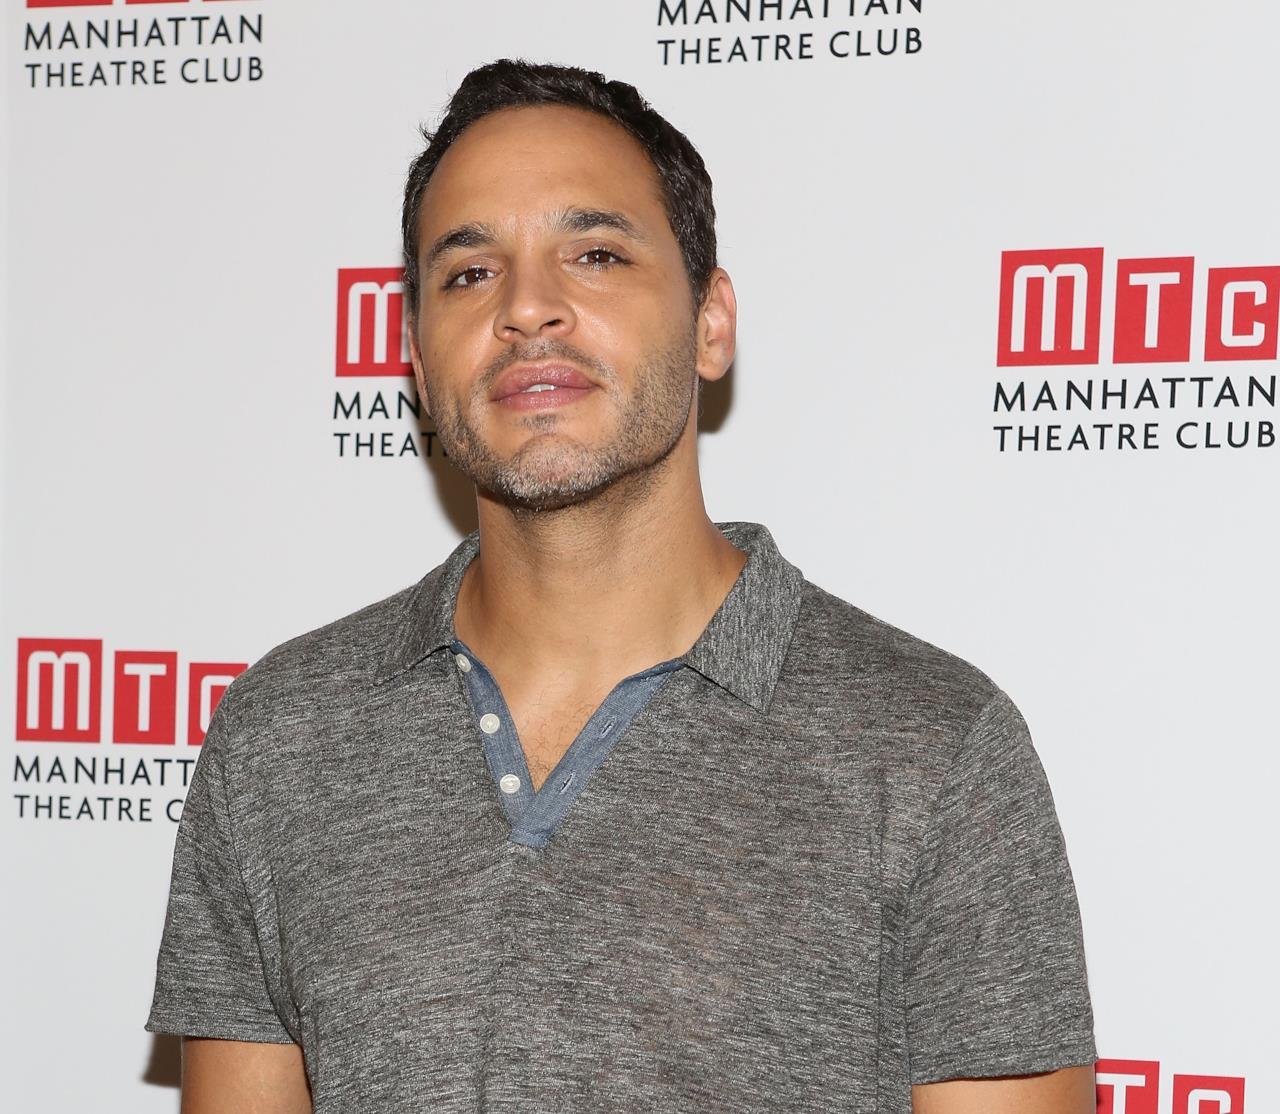 Daniel Sunjata al Manhattan Theatre Club